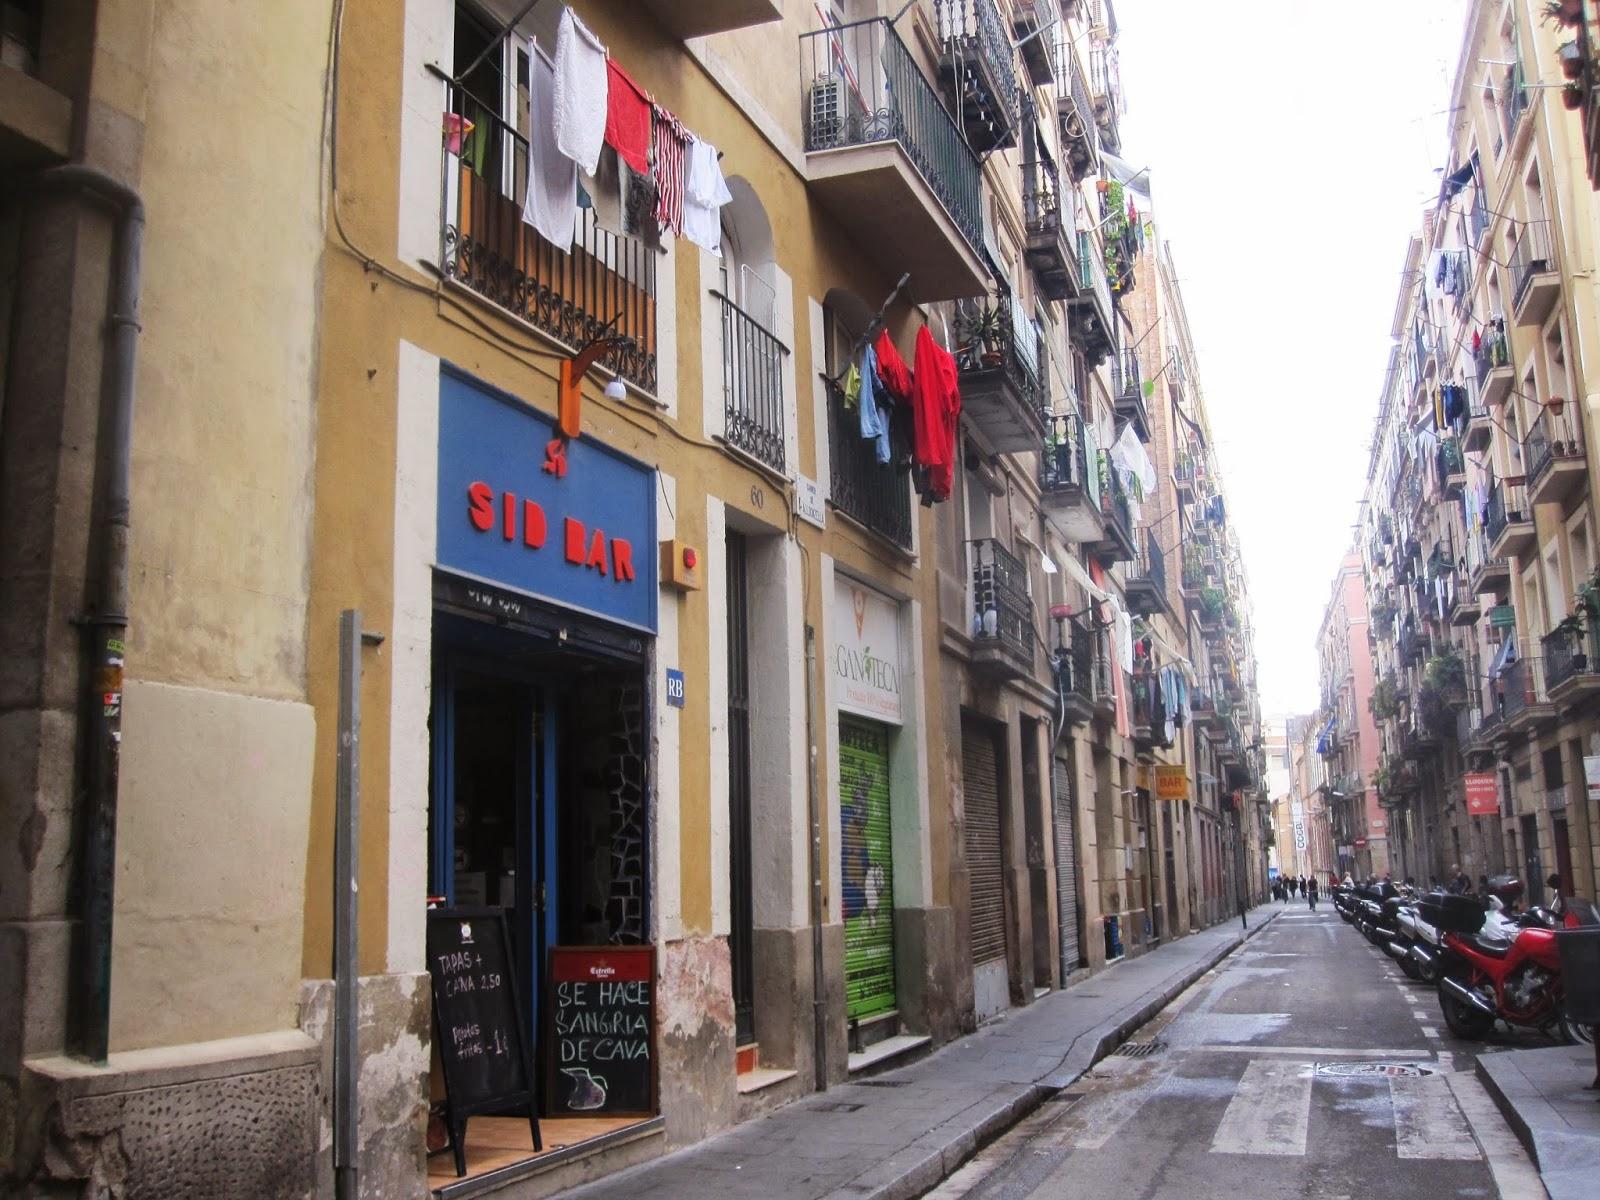 Tot barcelona l mpara jamonera dise o barcelona - Lamparas de diseno barcelona ...